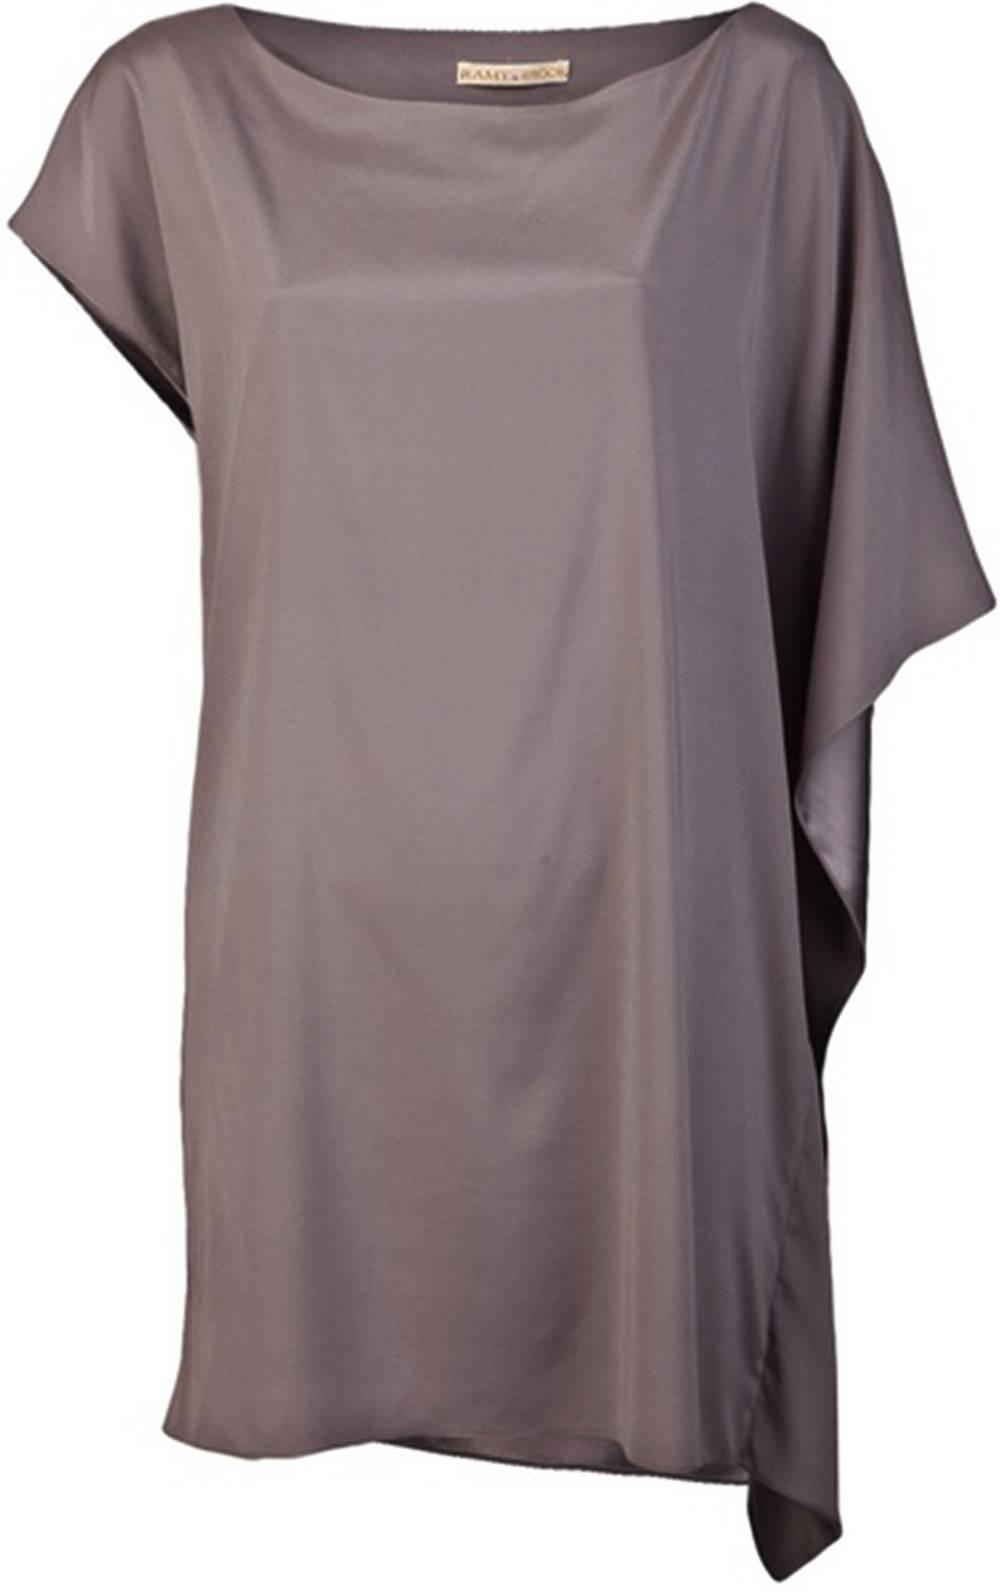 ramy-brook-steel-marcie-dress-product-1-1083069-709899886_large_flex